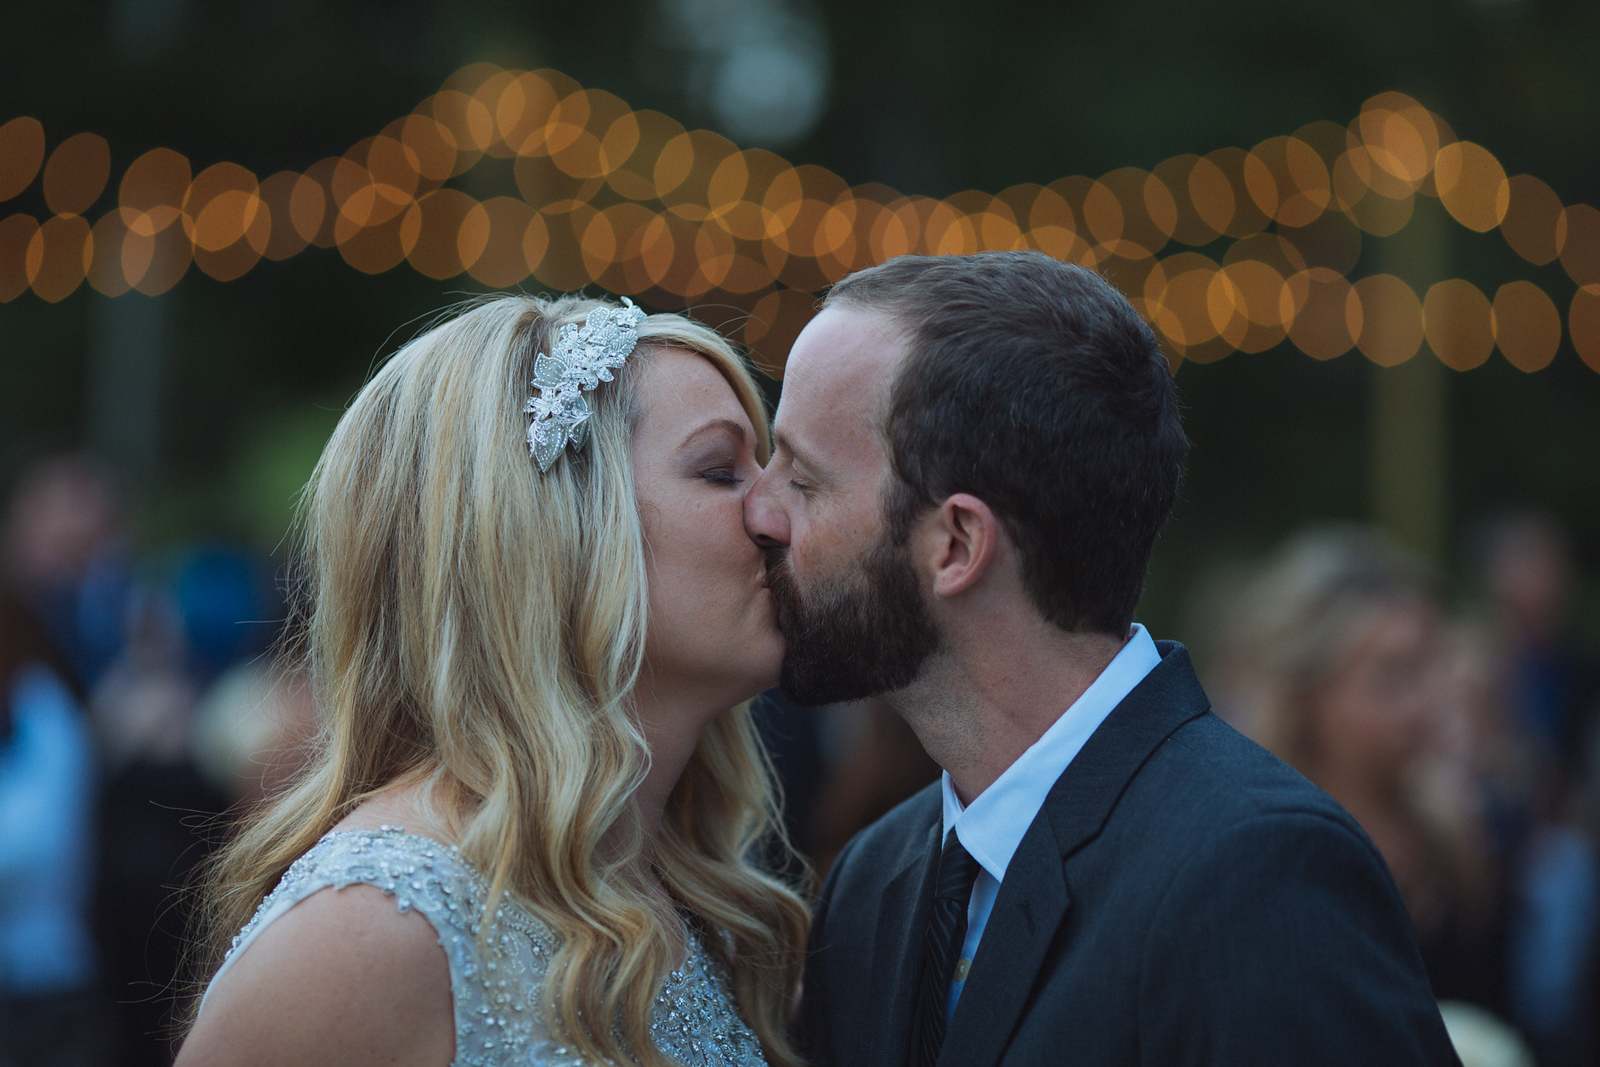 The kiss - Janna and Nick